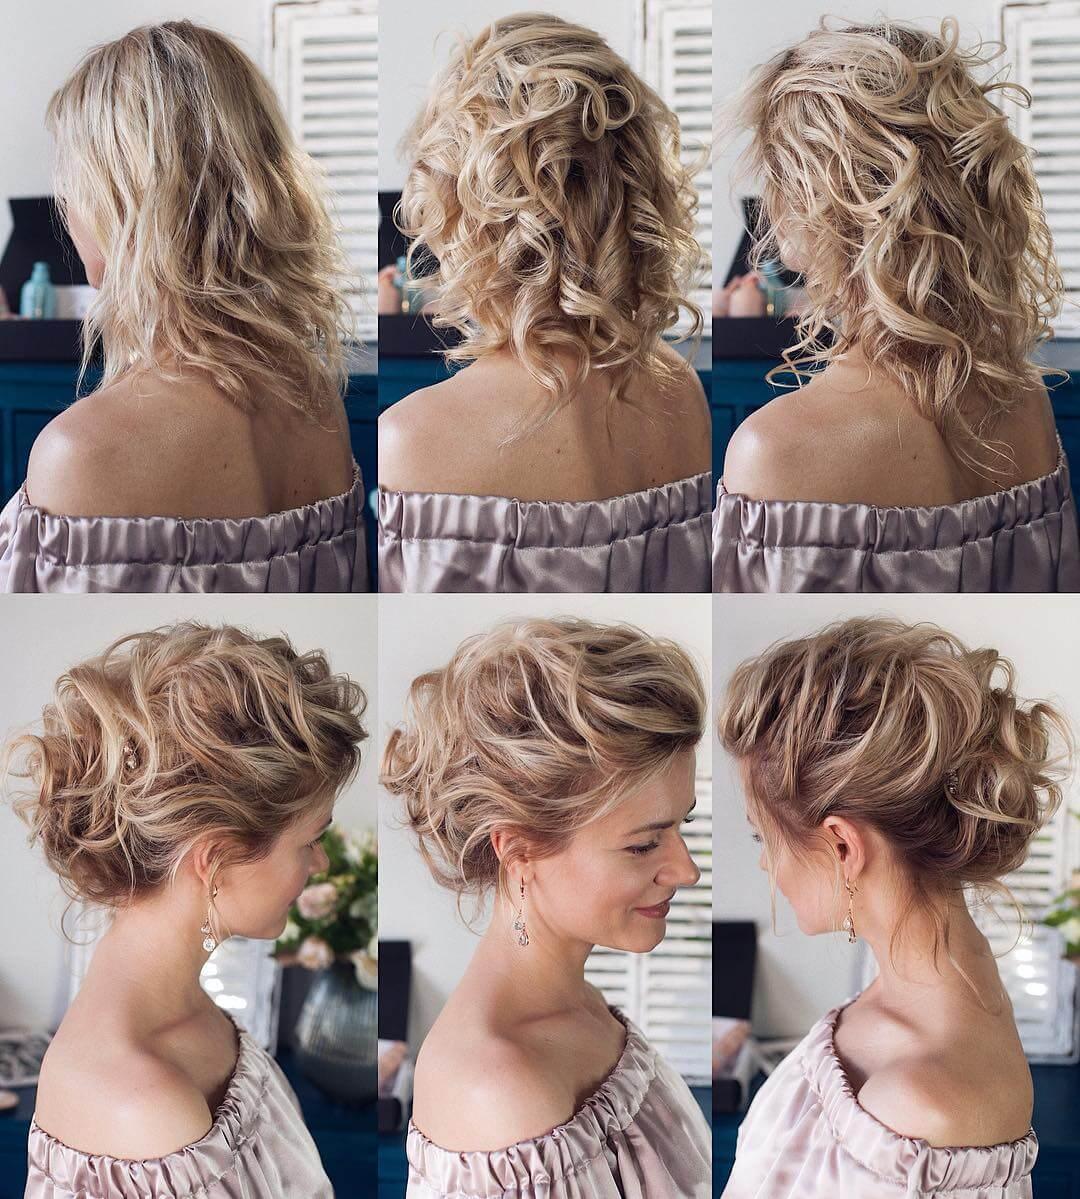 Step by Step Super messy hair bun Hairstyles for Long, Medium, Short Hair